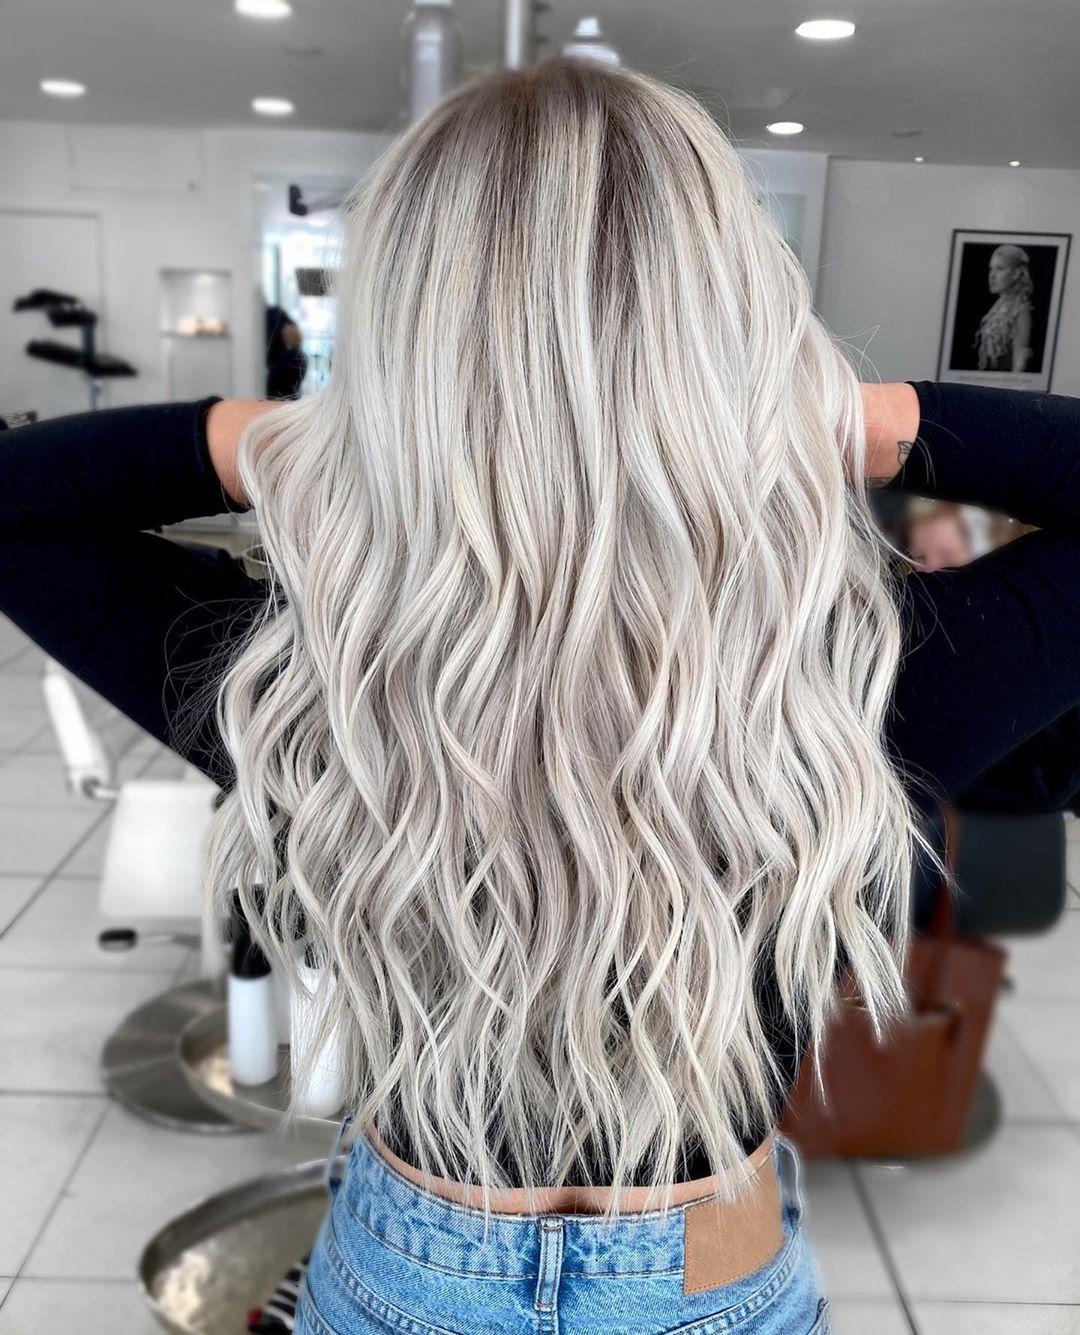 Blonde Balayage Expert On Instagram Sea Salt Blonde Now This Is Hair That Belongs At The Blonde Hair Shades Blonde Hair Color Ash Blonde Hair Colour